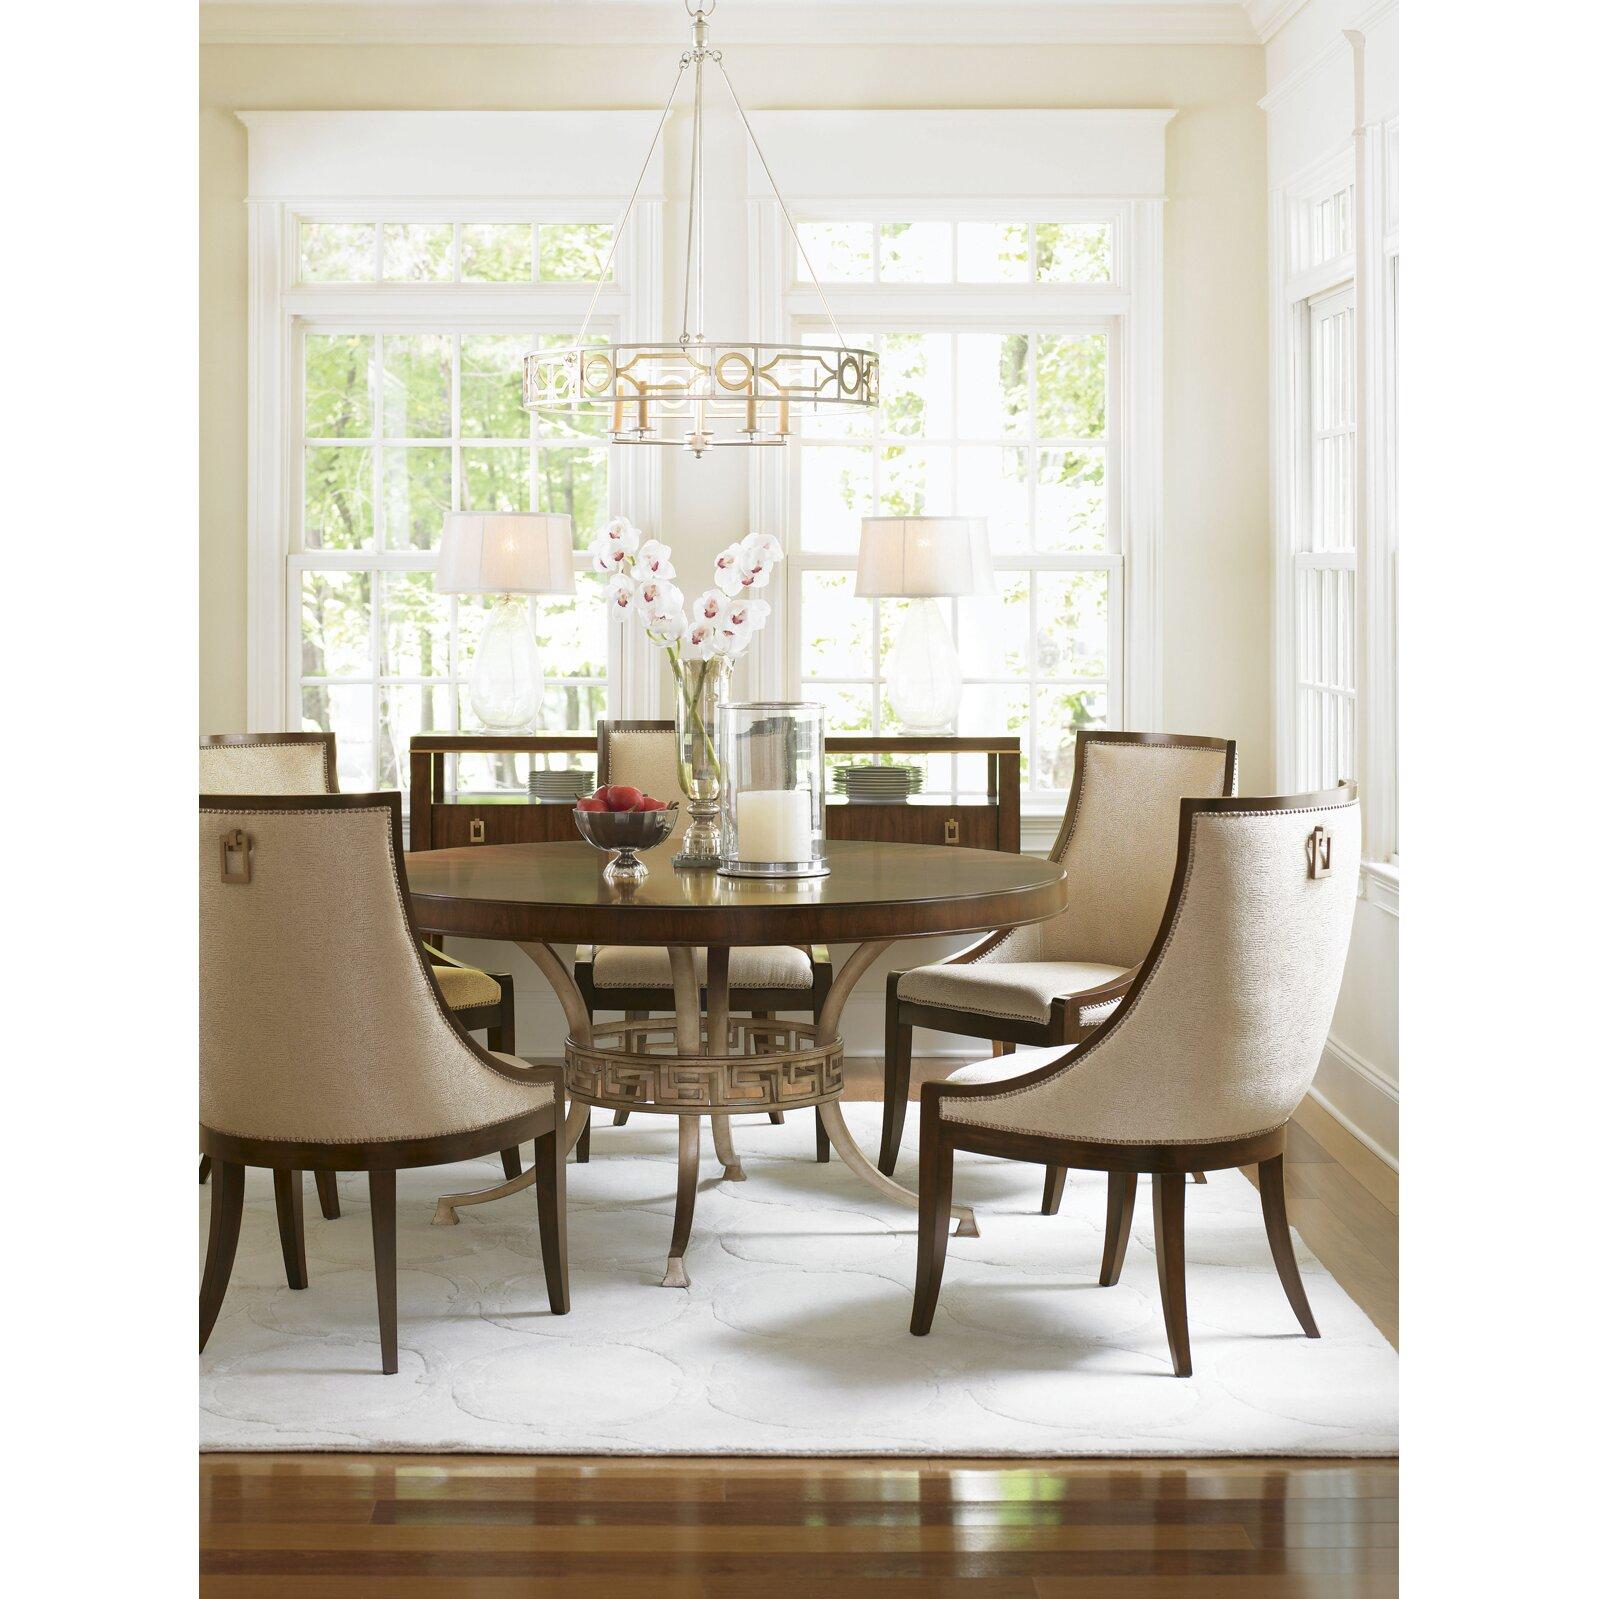 Lexington Tower Place Regis Dining Table Reviews Wayfair. Lexington Cherry  Dining Room Set Ktvb Us